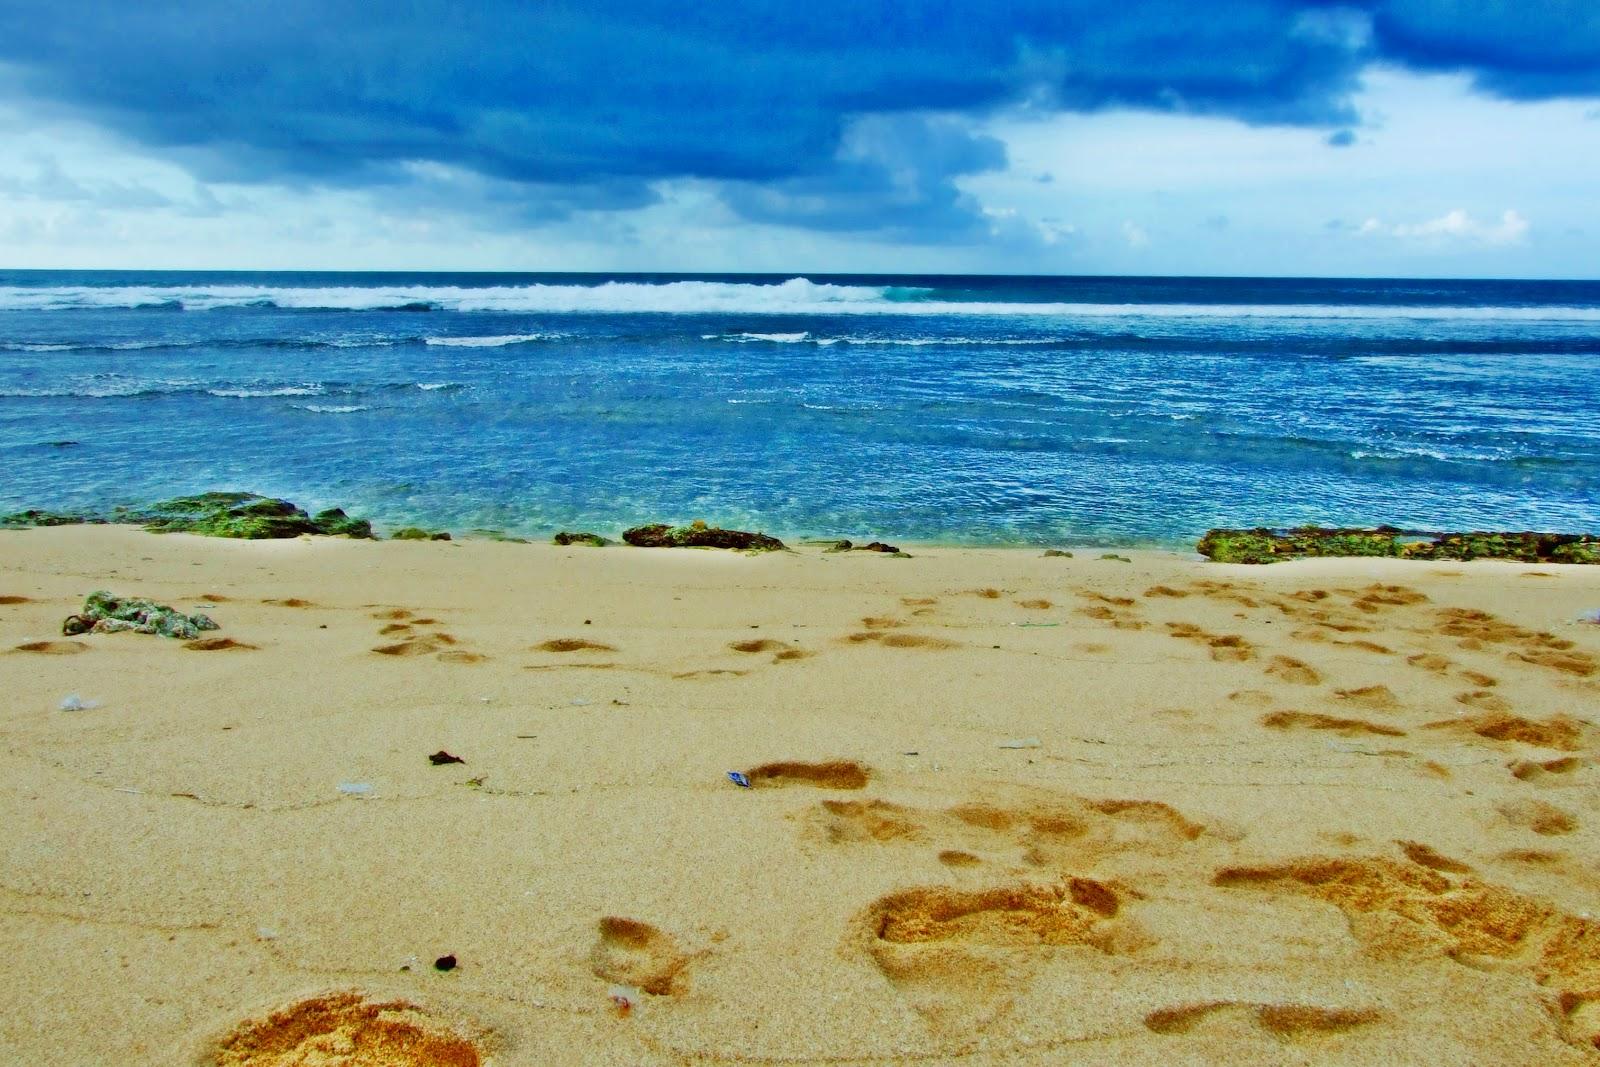 Pantai Matahari Carita Salah Satu Pesisir Utara Banten Terasa Pas